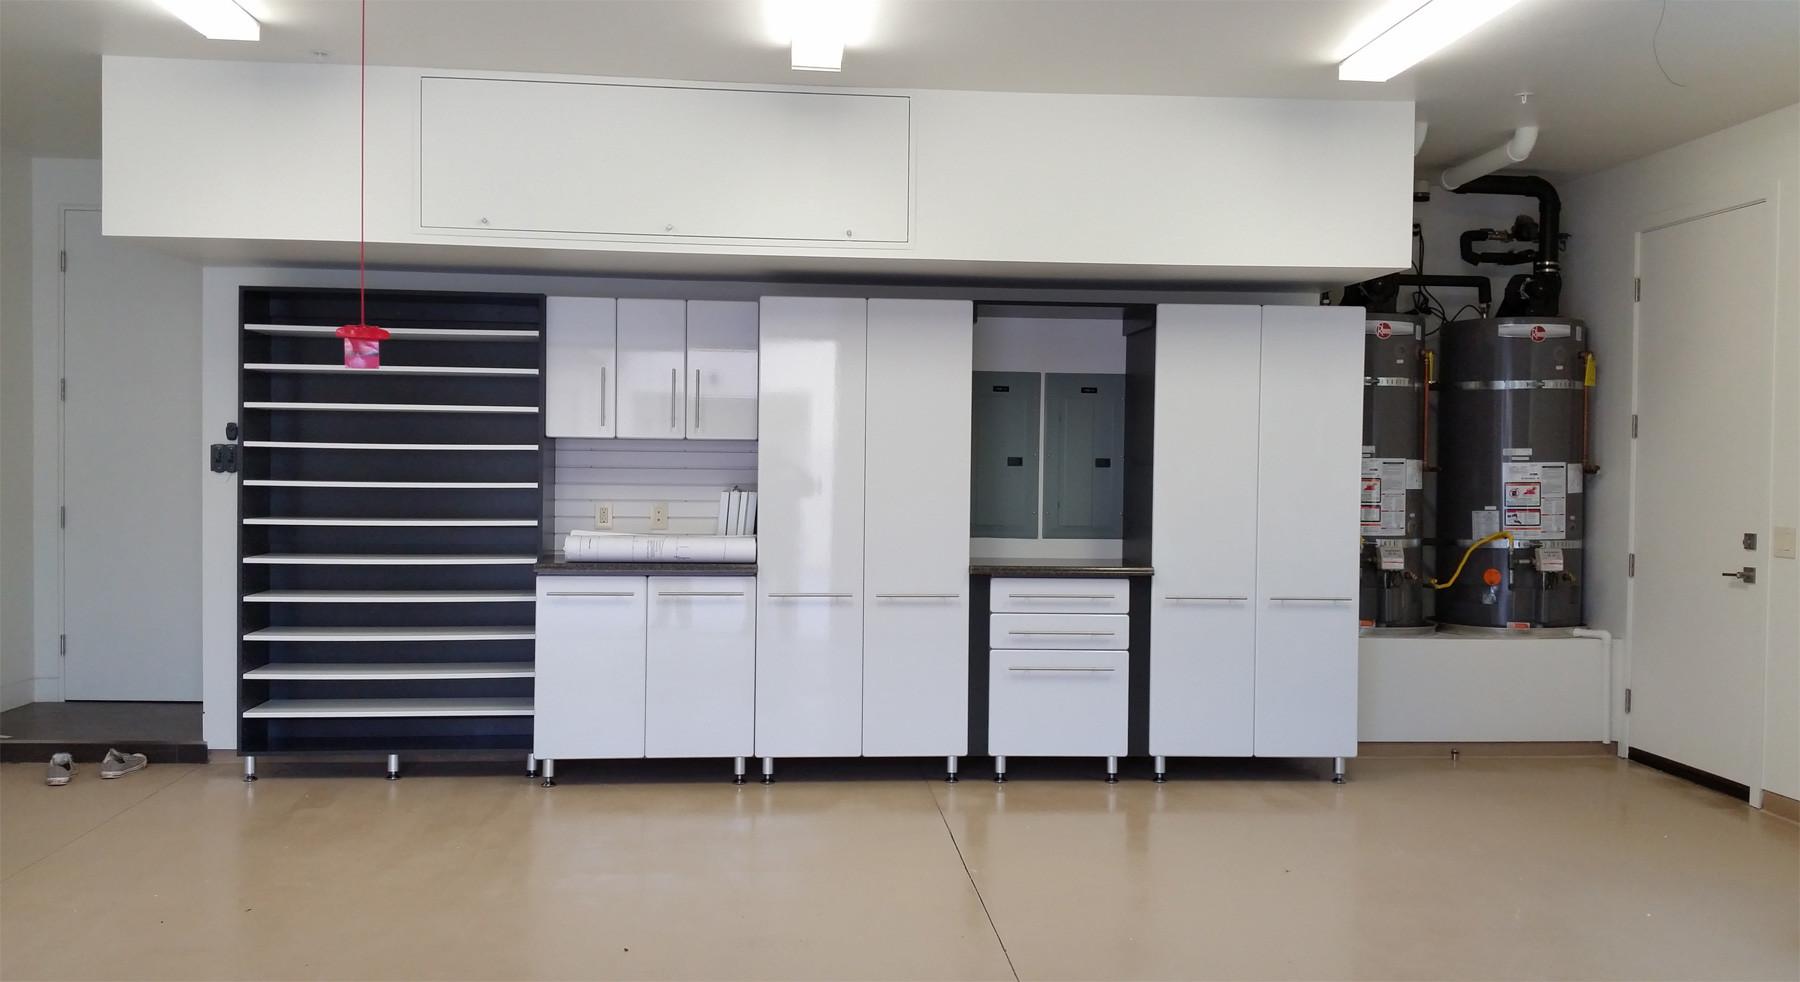 Garage Organization Systems  Custom Garage Cabinets and Garage Organization Systems